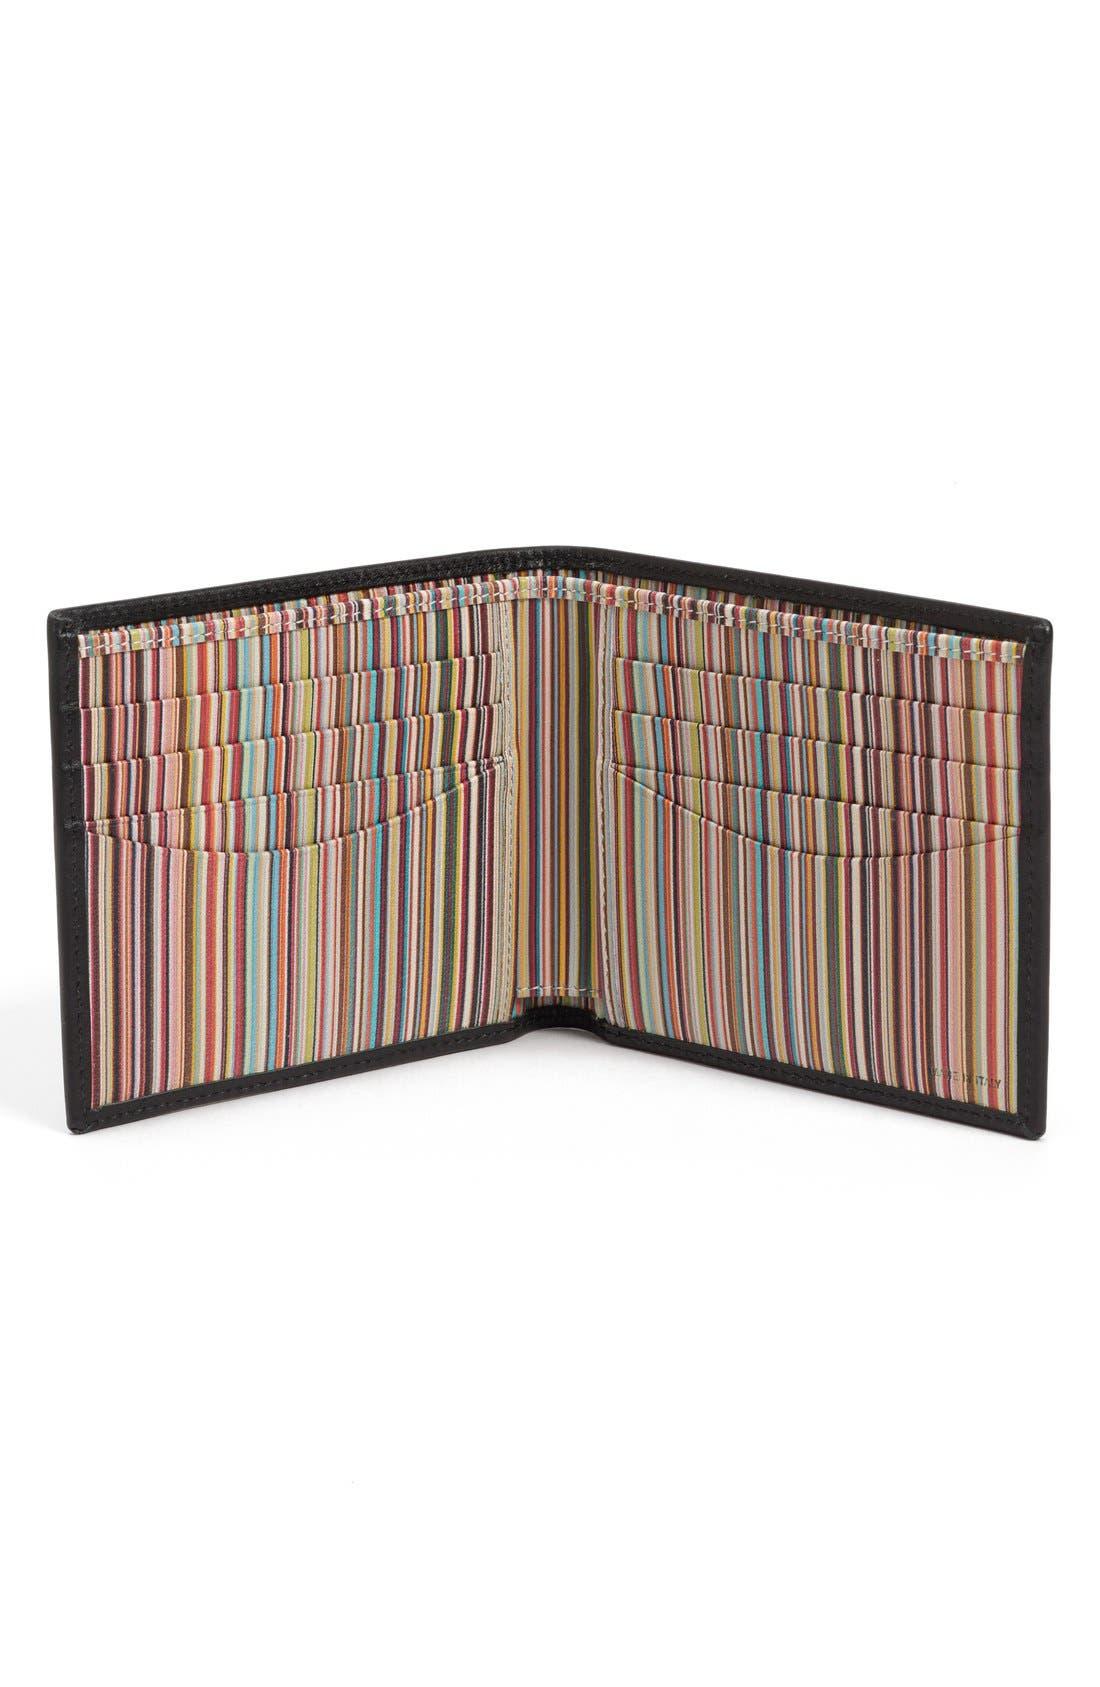 Interior Stripe Leather Billfold,                             Alternate thumbnail 2, color,                             Black